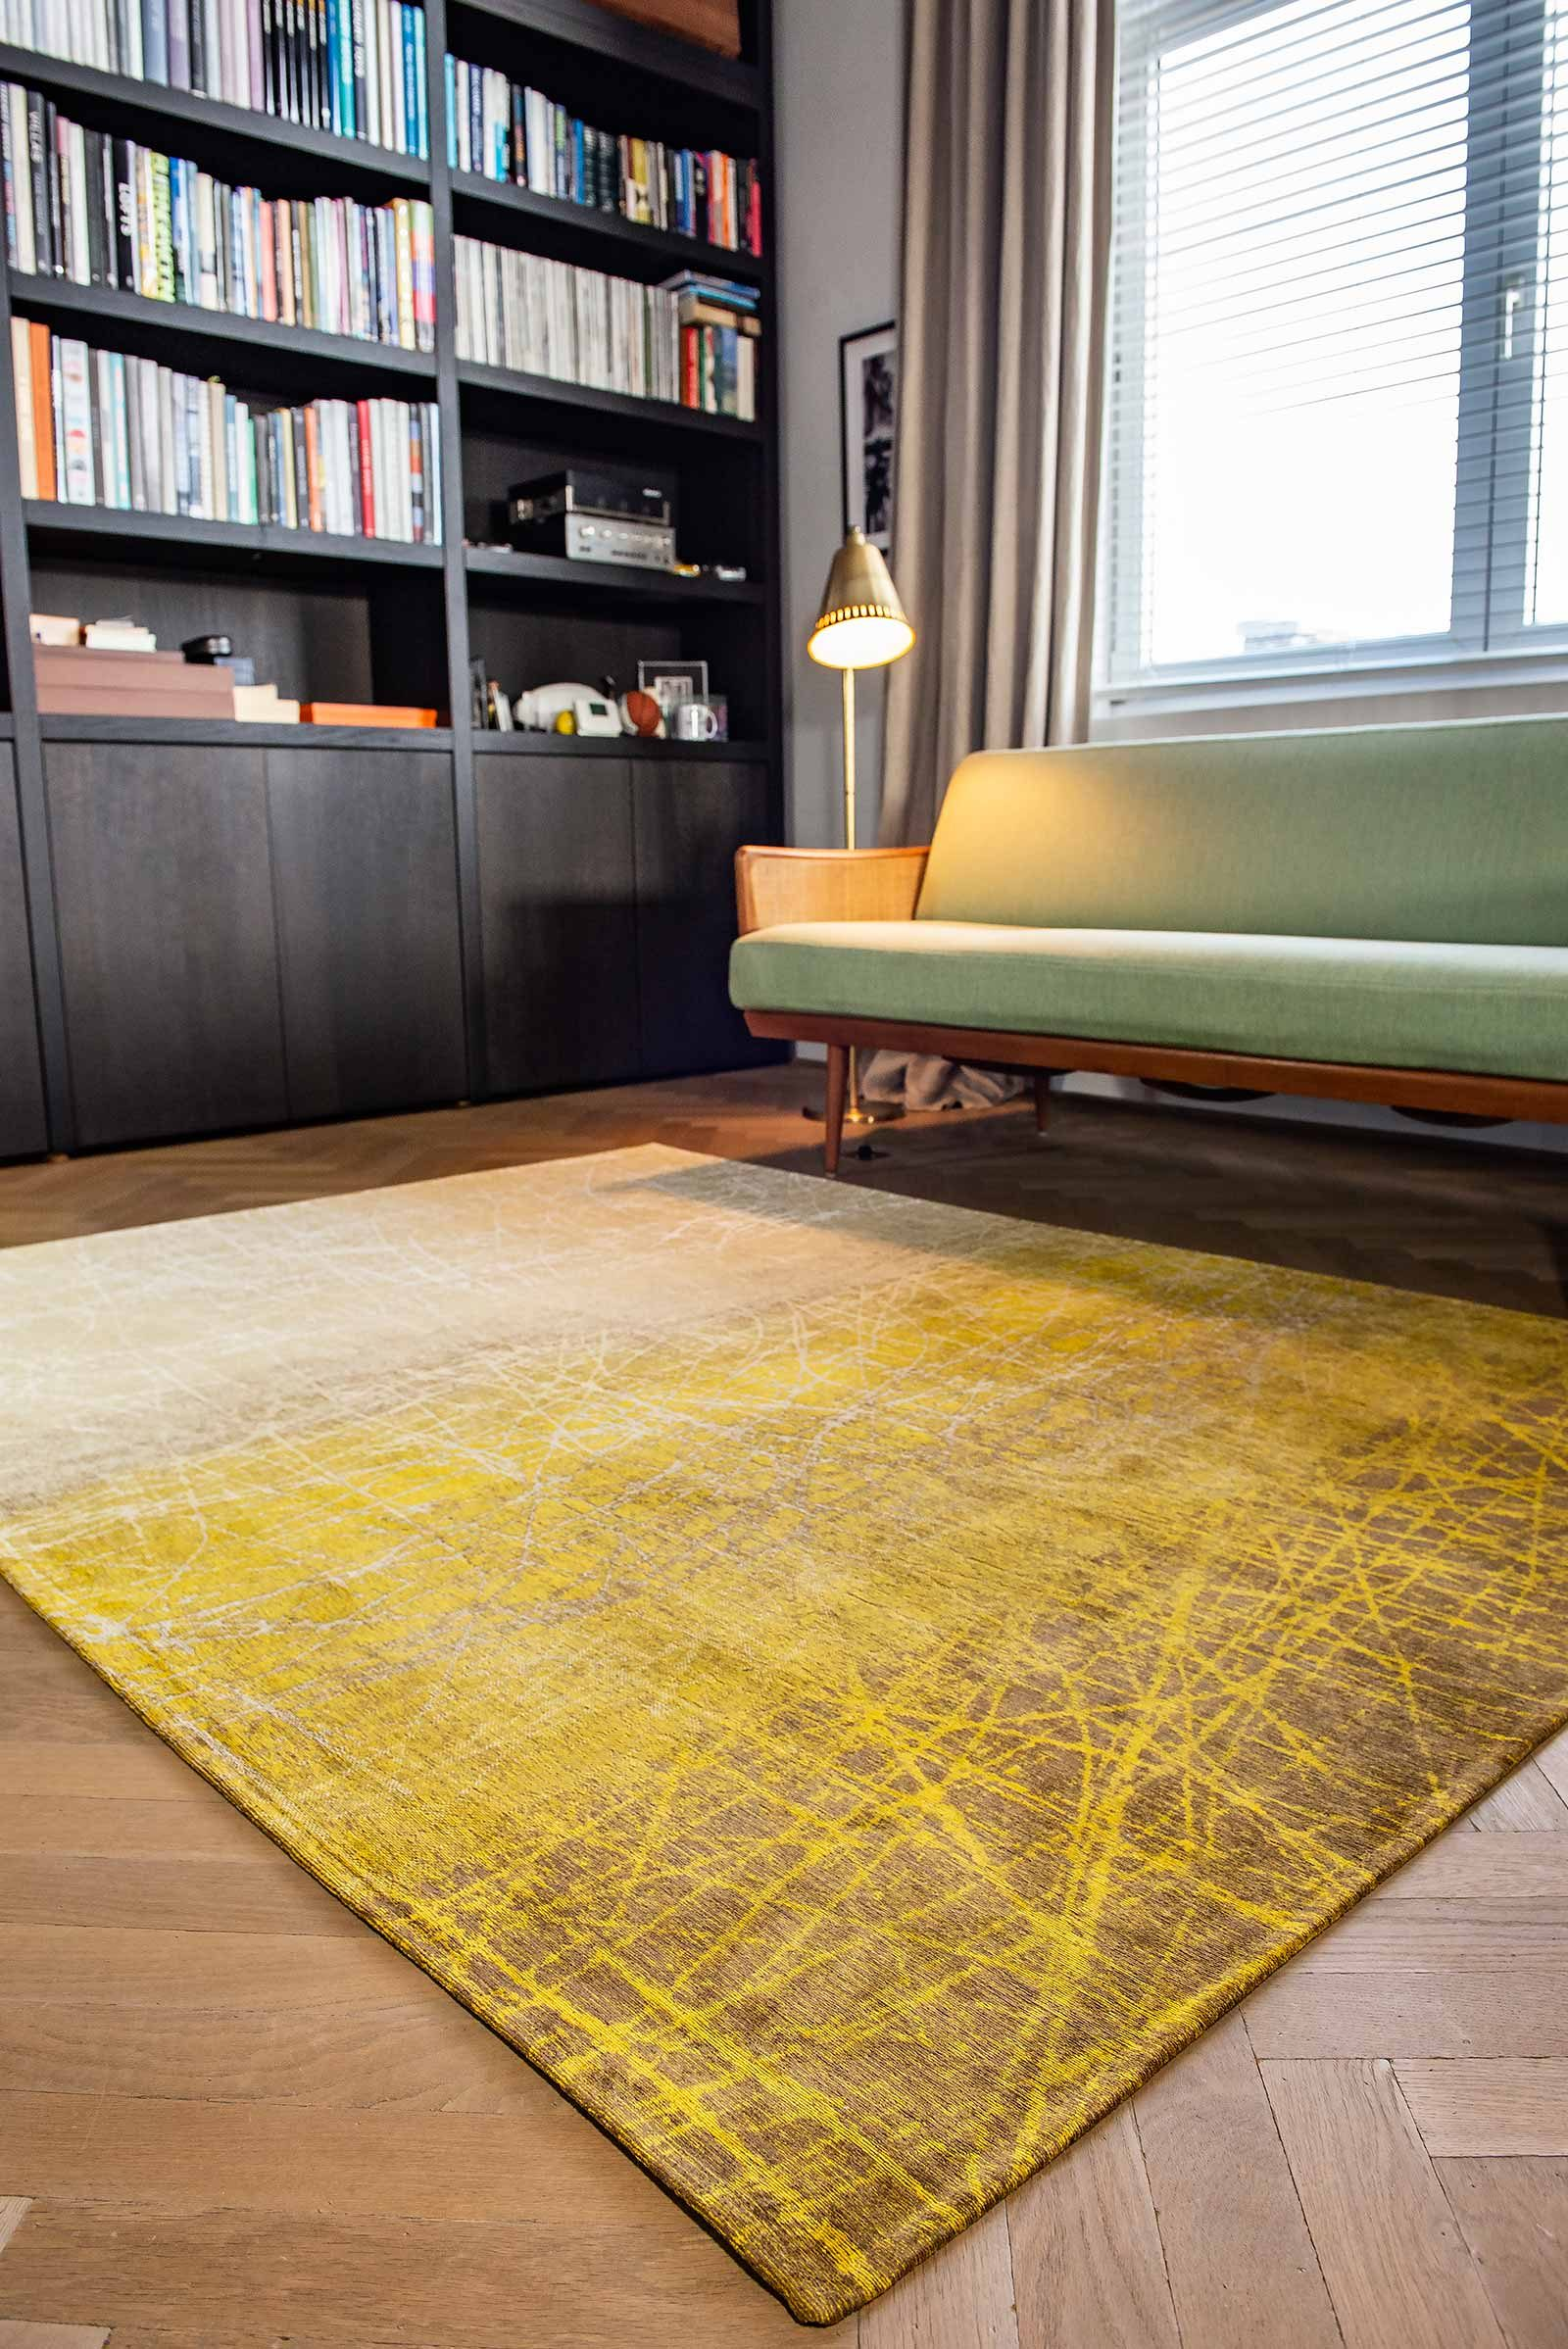 alfombras Louis De Poortere LX 8879 Mad Men Fahrenheit New York Fall interior 2